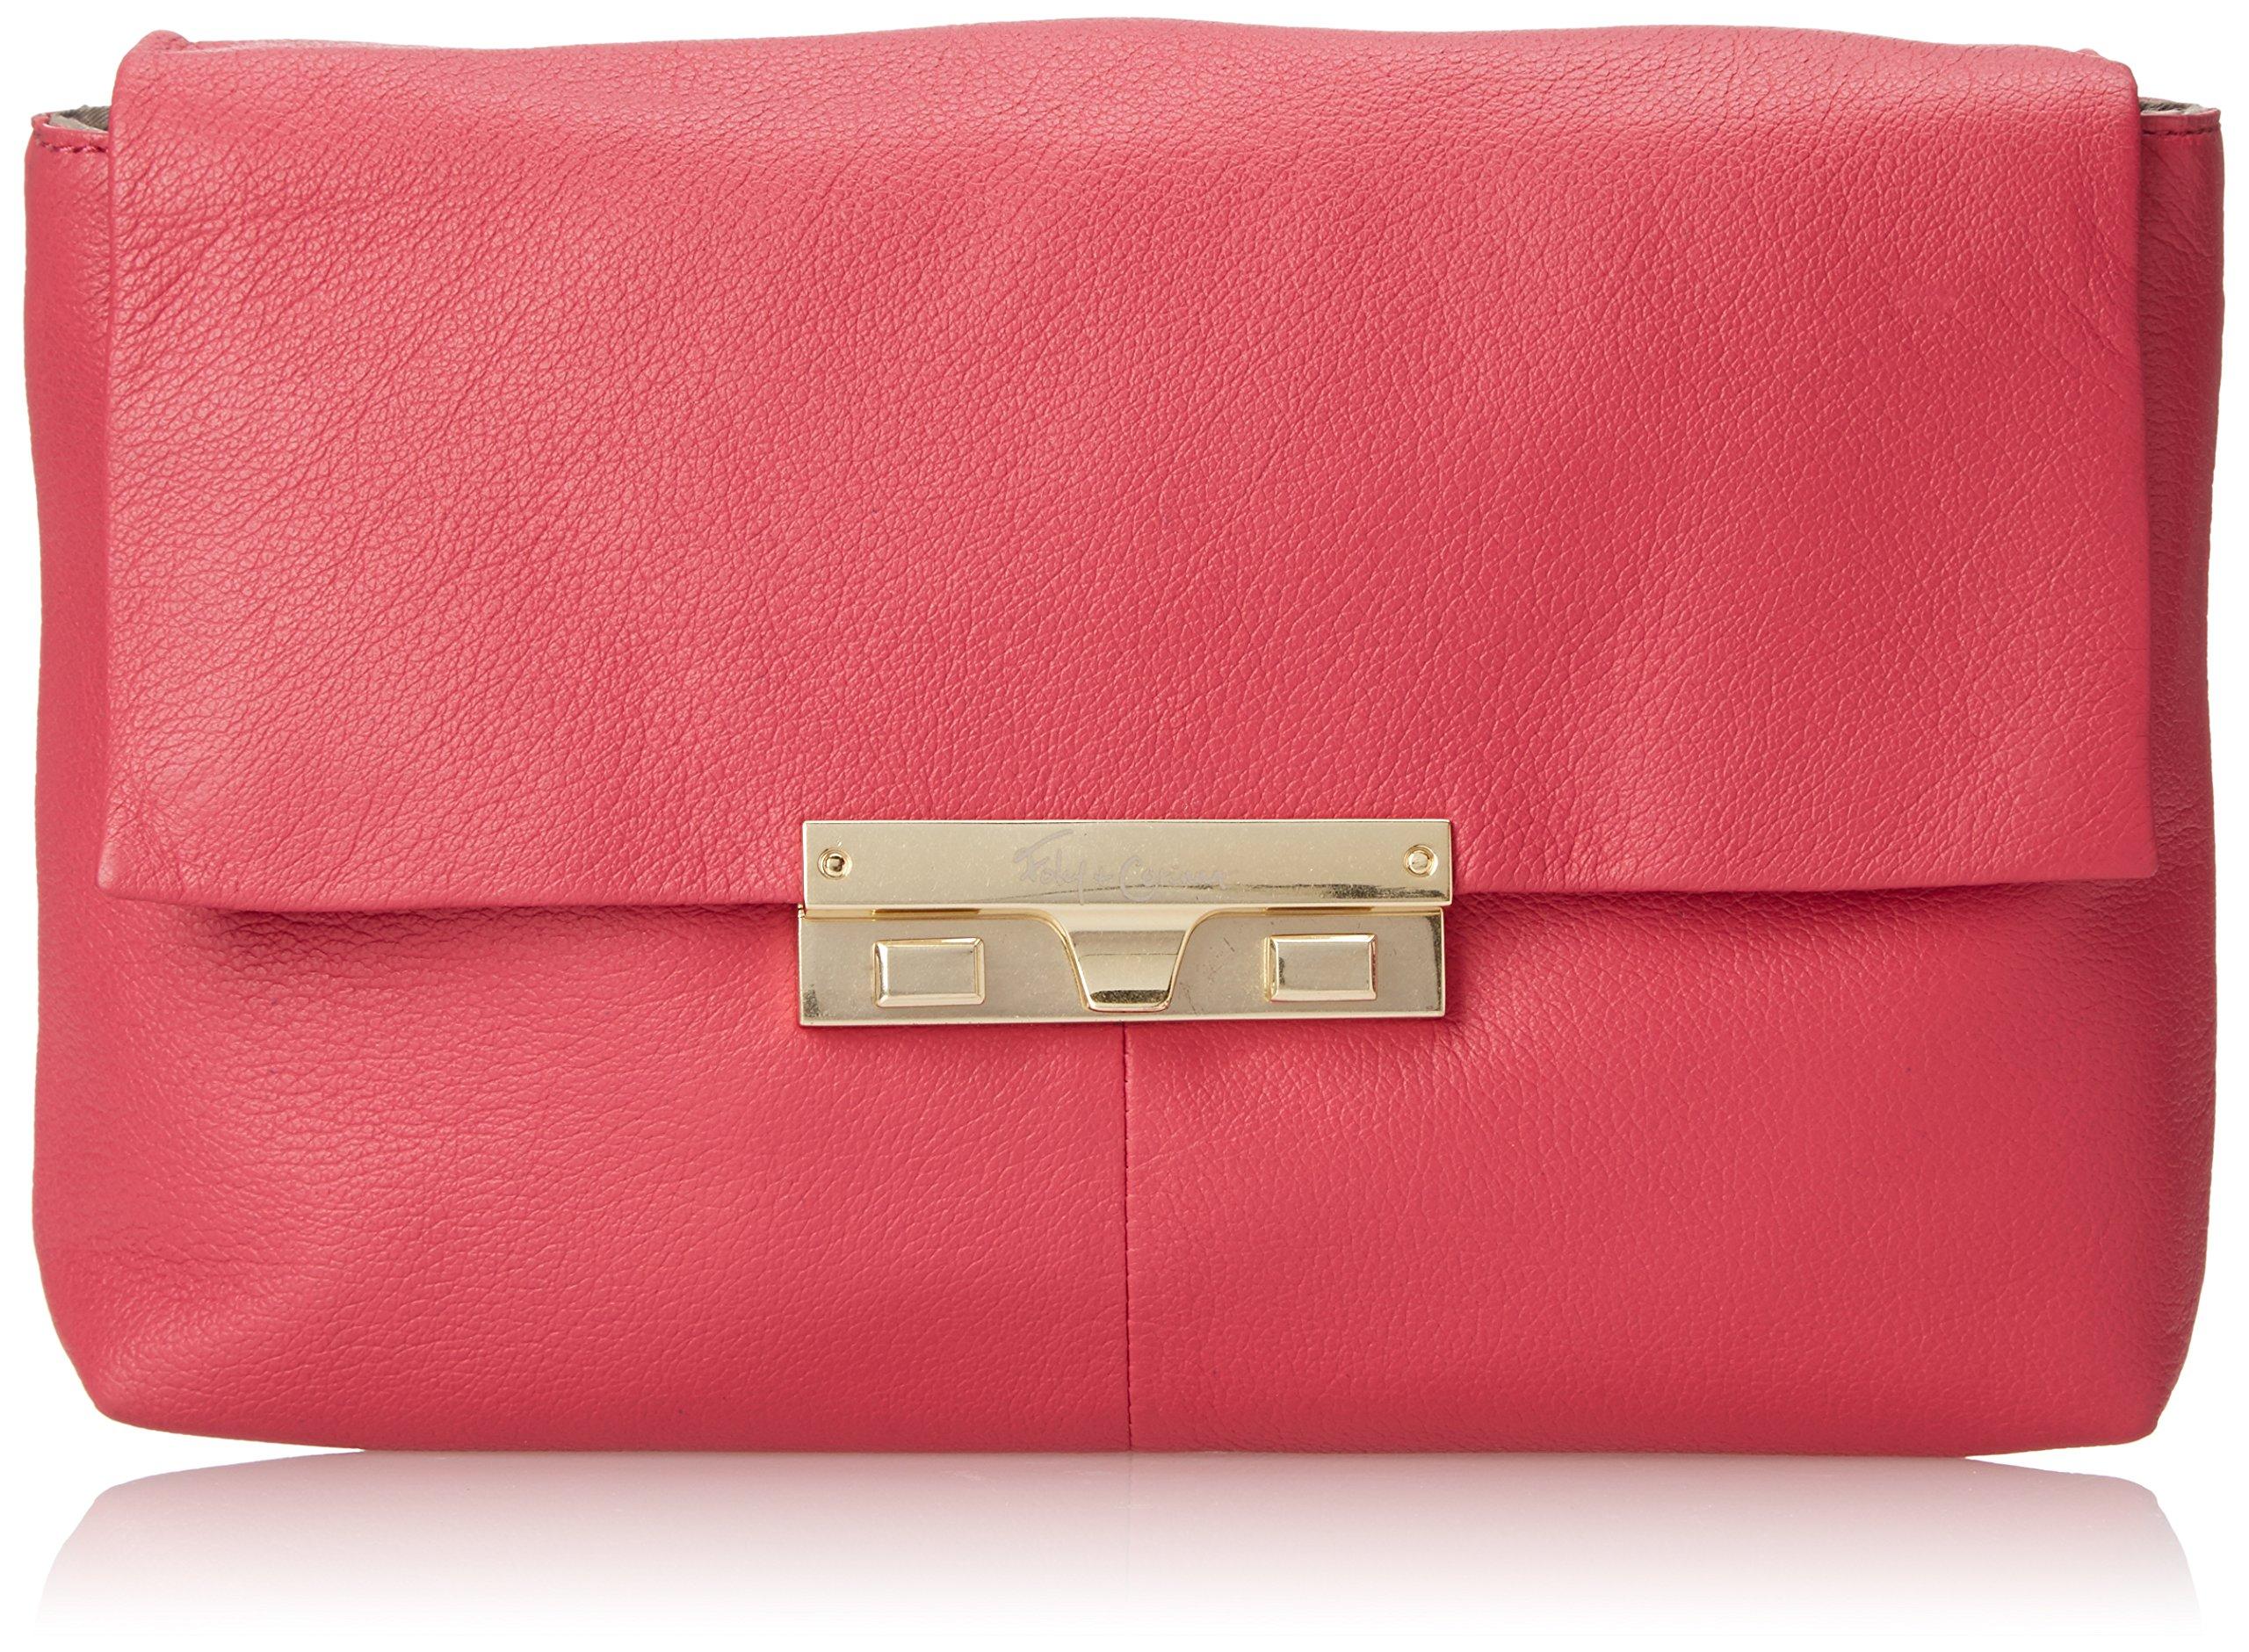 Foley + Corinna Bea Clutch Cross Body Bag, Rose, One Size by Foley + Corinna (Image #1)